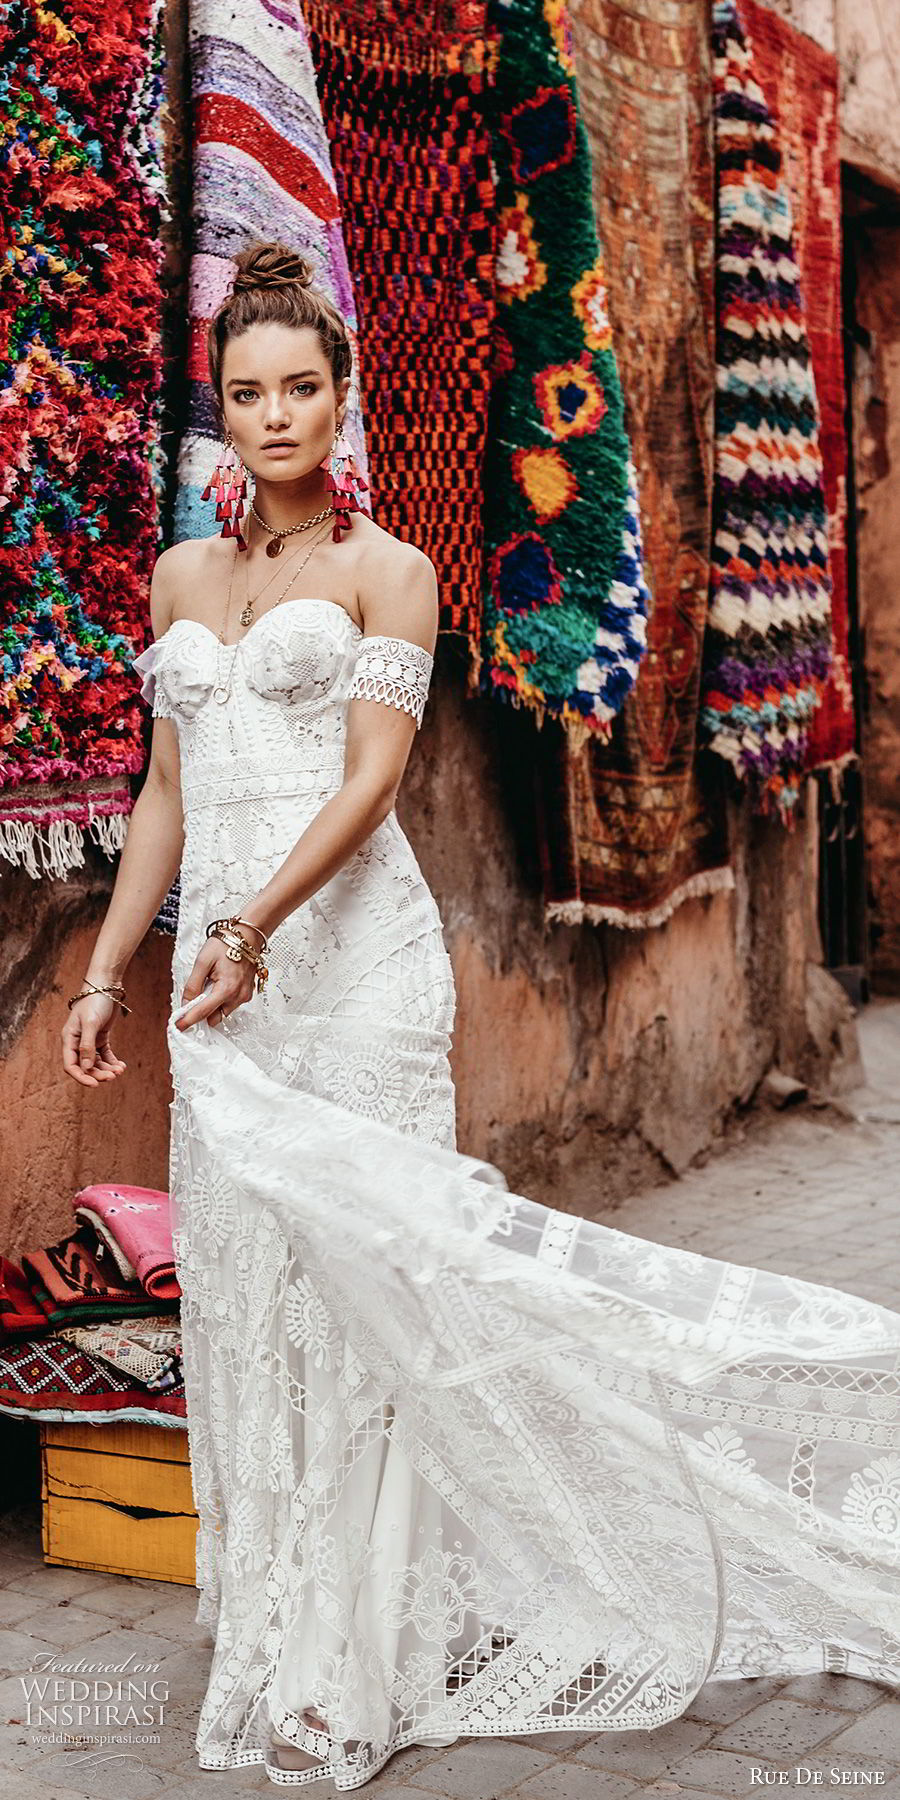 rue de seine 2019 bridal strapless sweetheart neckline detached short sleeves fully embellished crochet lace fit flare a line wedding dress (5) romantic boho chic chapel train mv